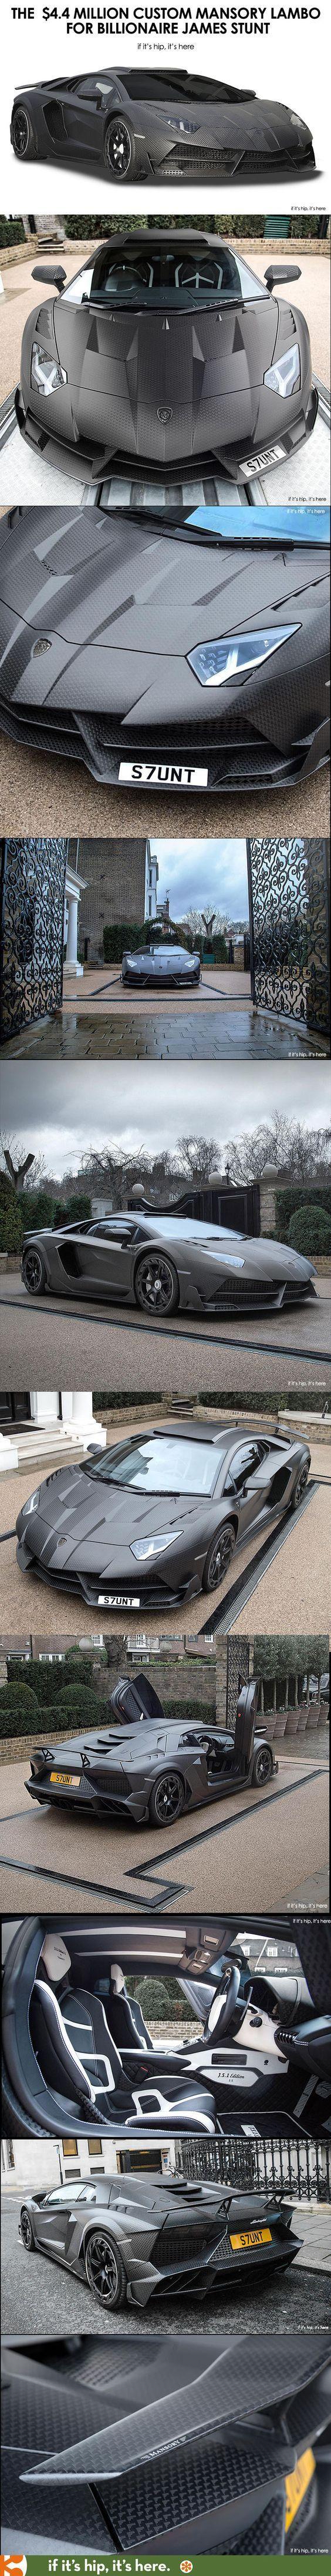 Aston DBC Follow @amazing_cars @amazing_cars @amazing_cars @amazing_cars http://www.buzzblend.com